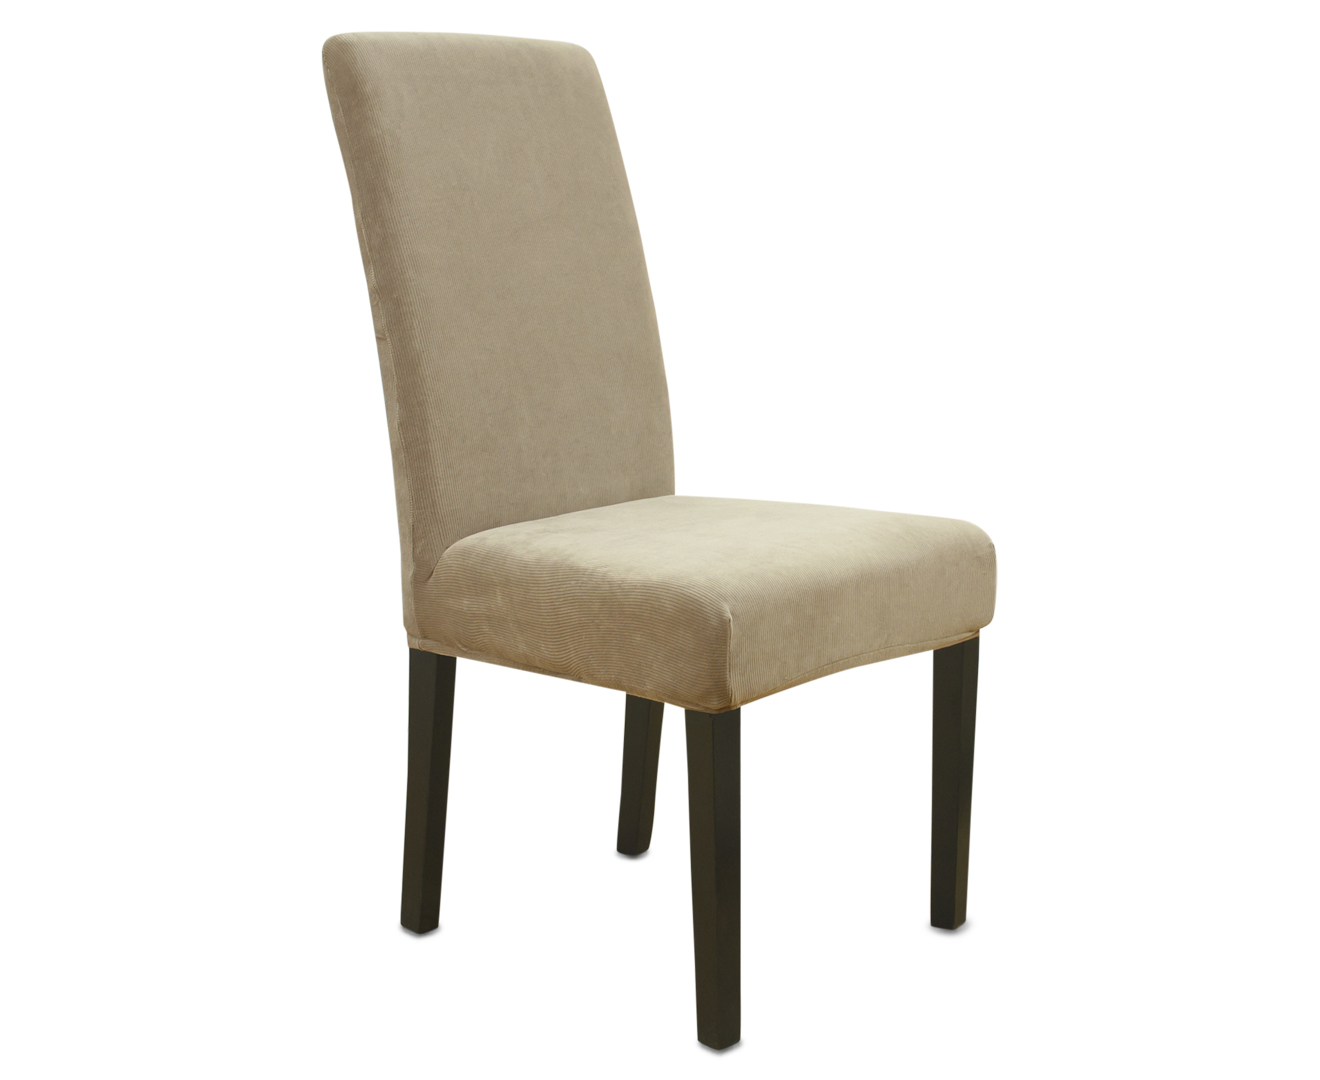 Sure Fit Stretch Dining Chair Cover Flax eBay : 59bb2e2b806fa532675405 from www.ebay.com.au size 1320 x 1080 jpeg 282kB